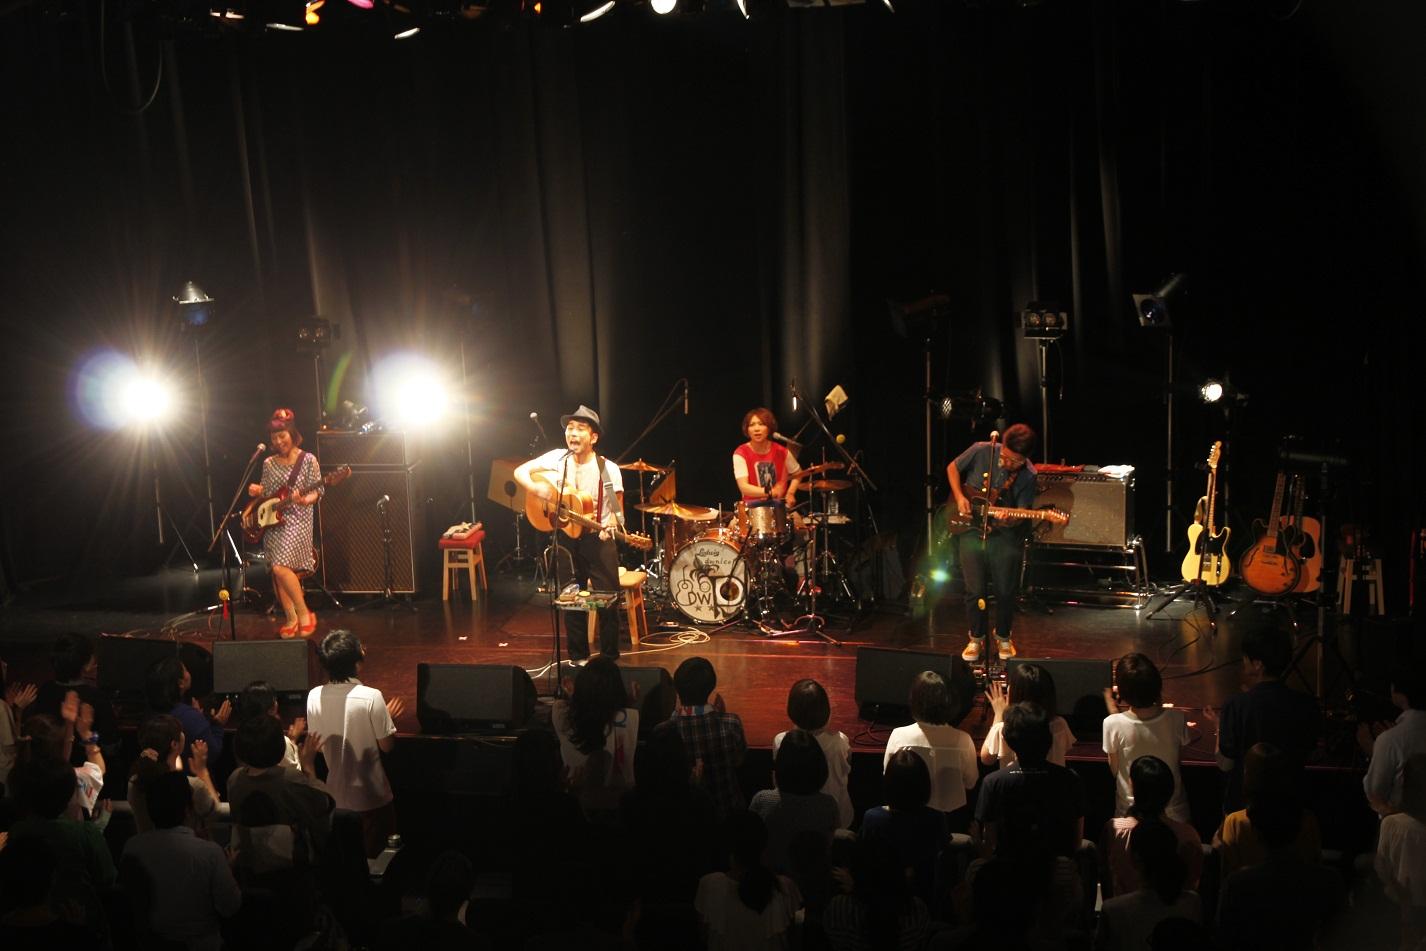 全国TOUR「スマイル大作戦!」東京公演